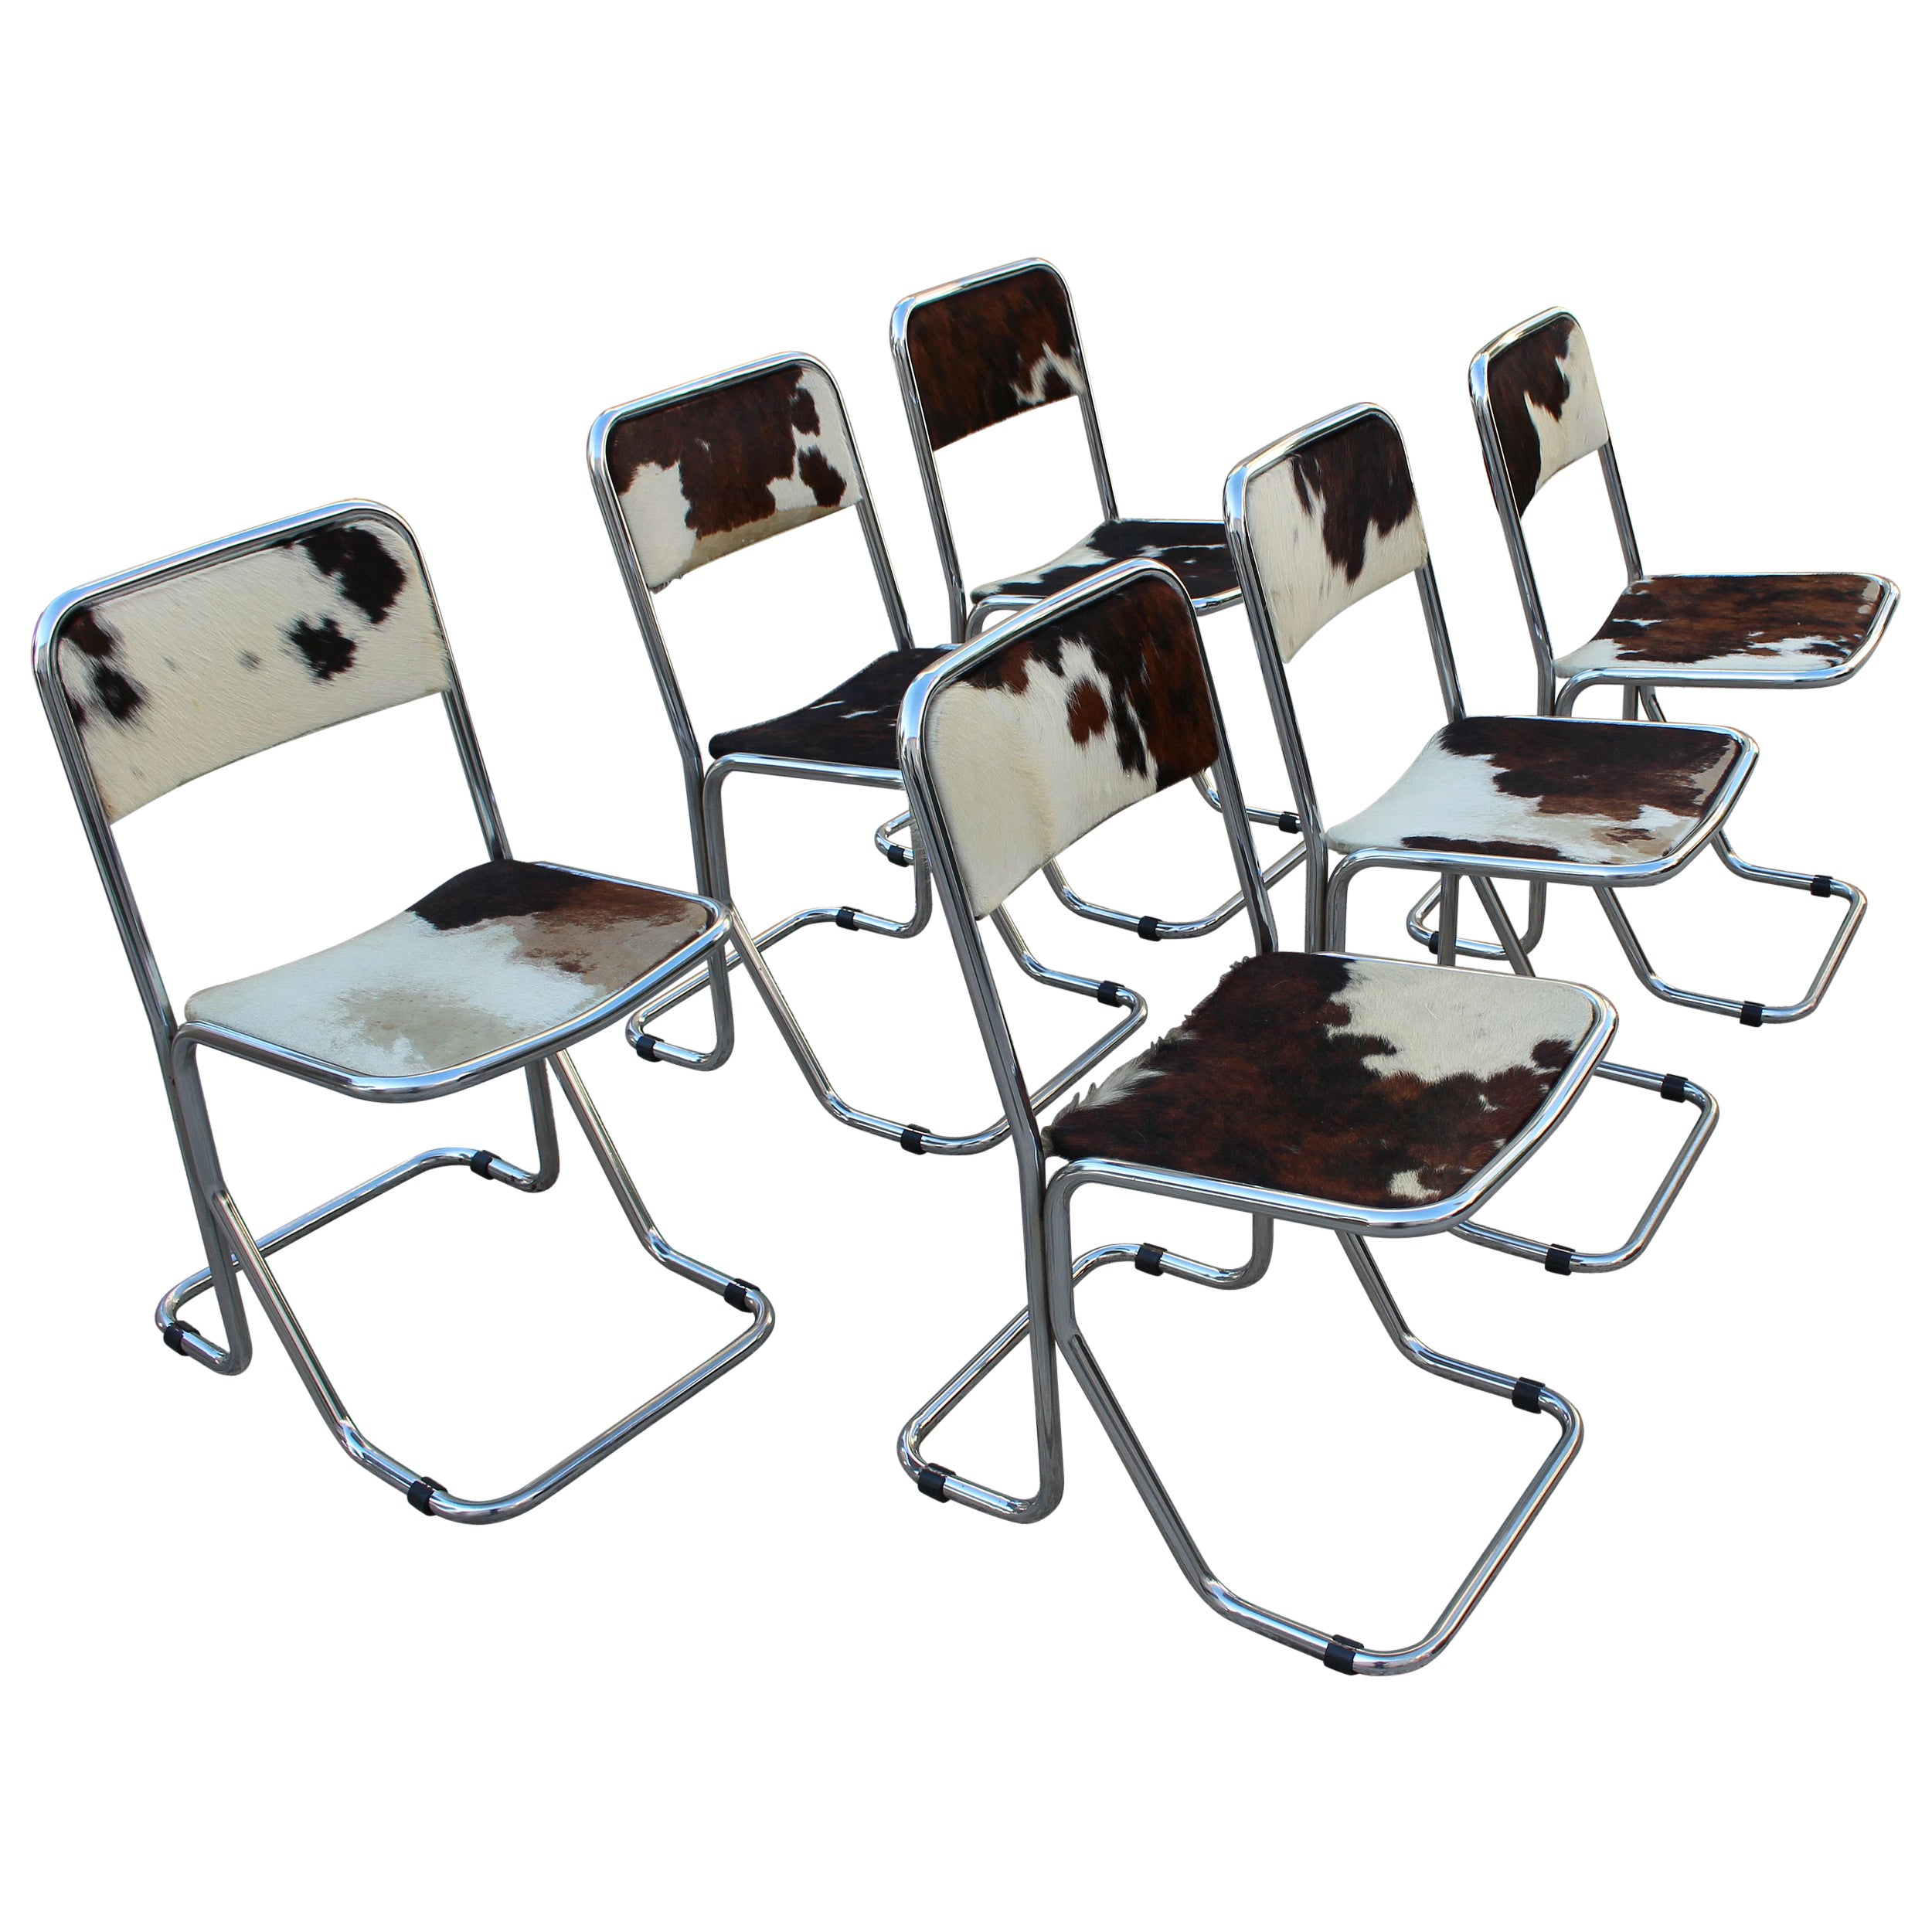 Swiss Mid-Century Modern Set of 6 Chairs